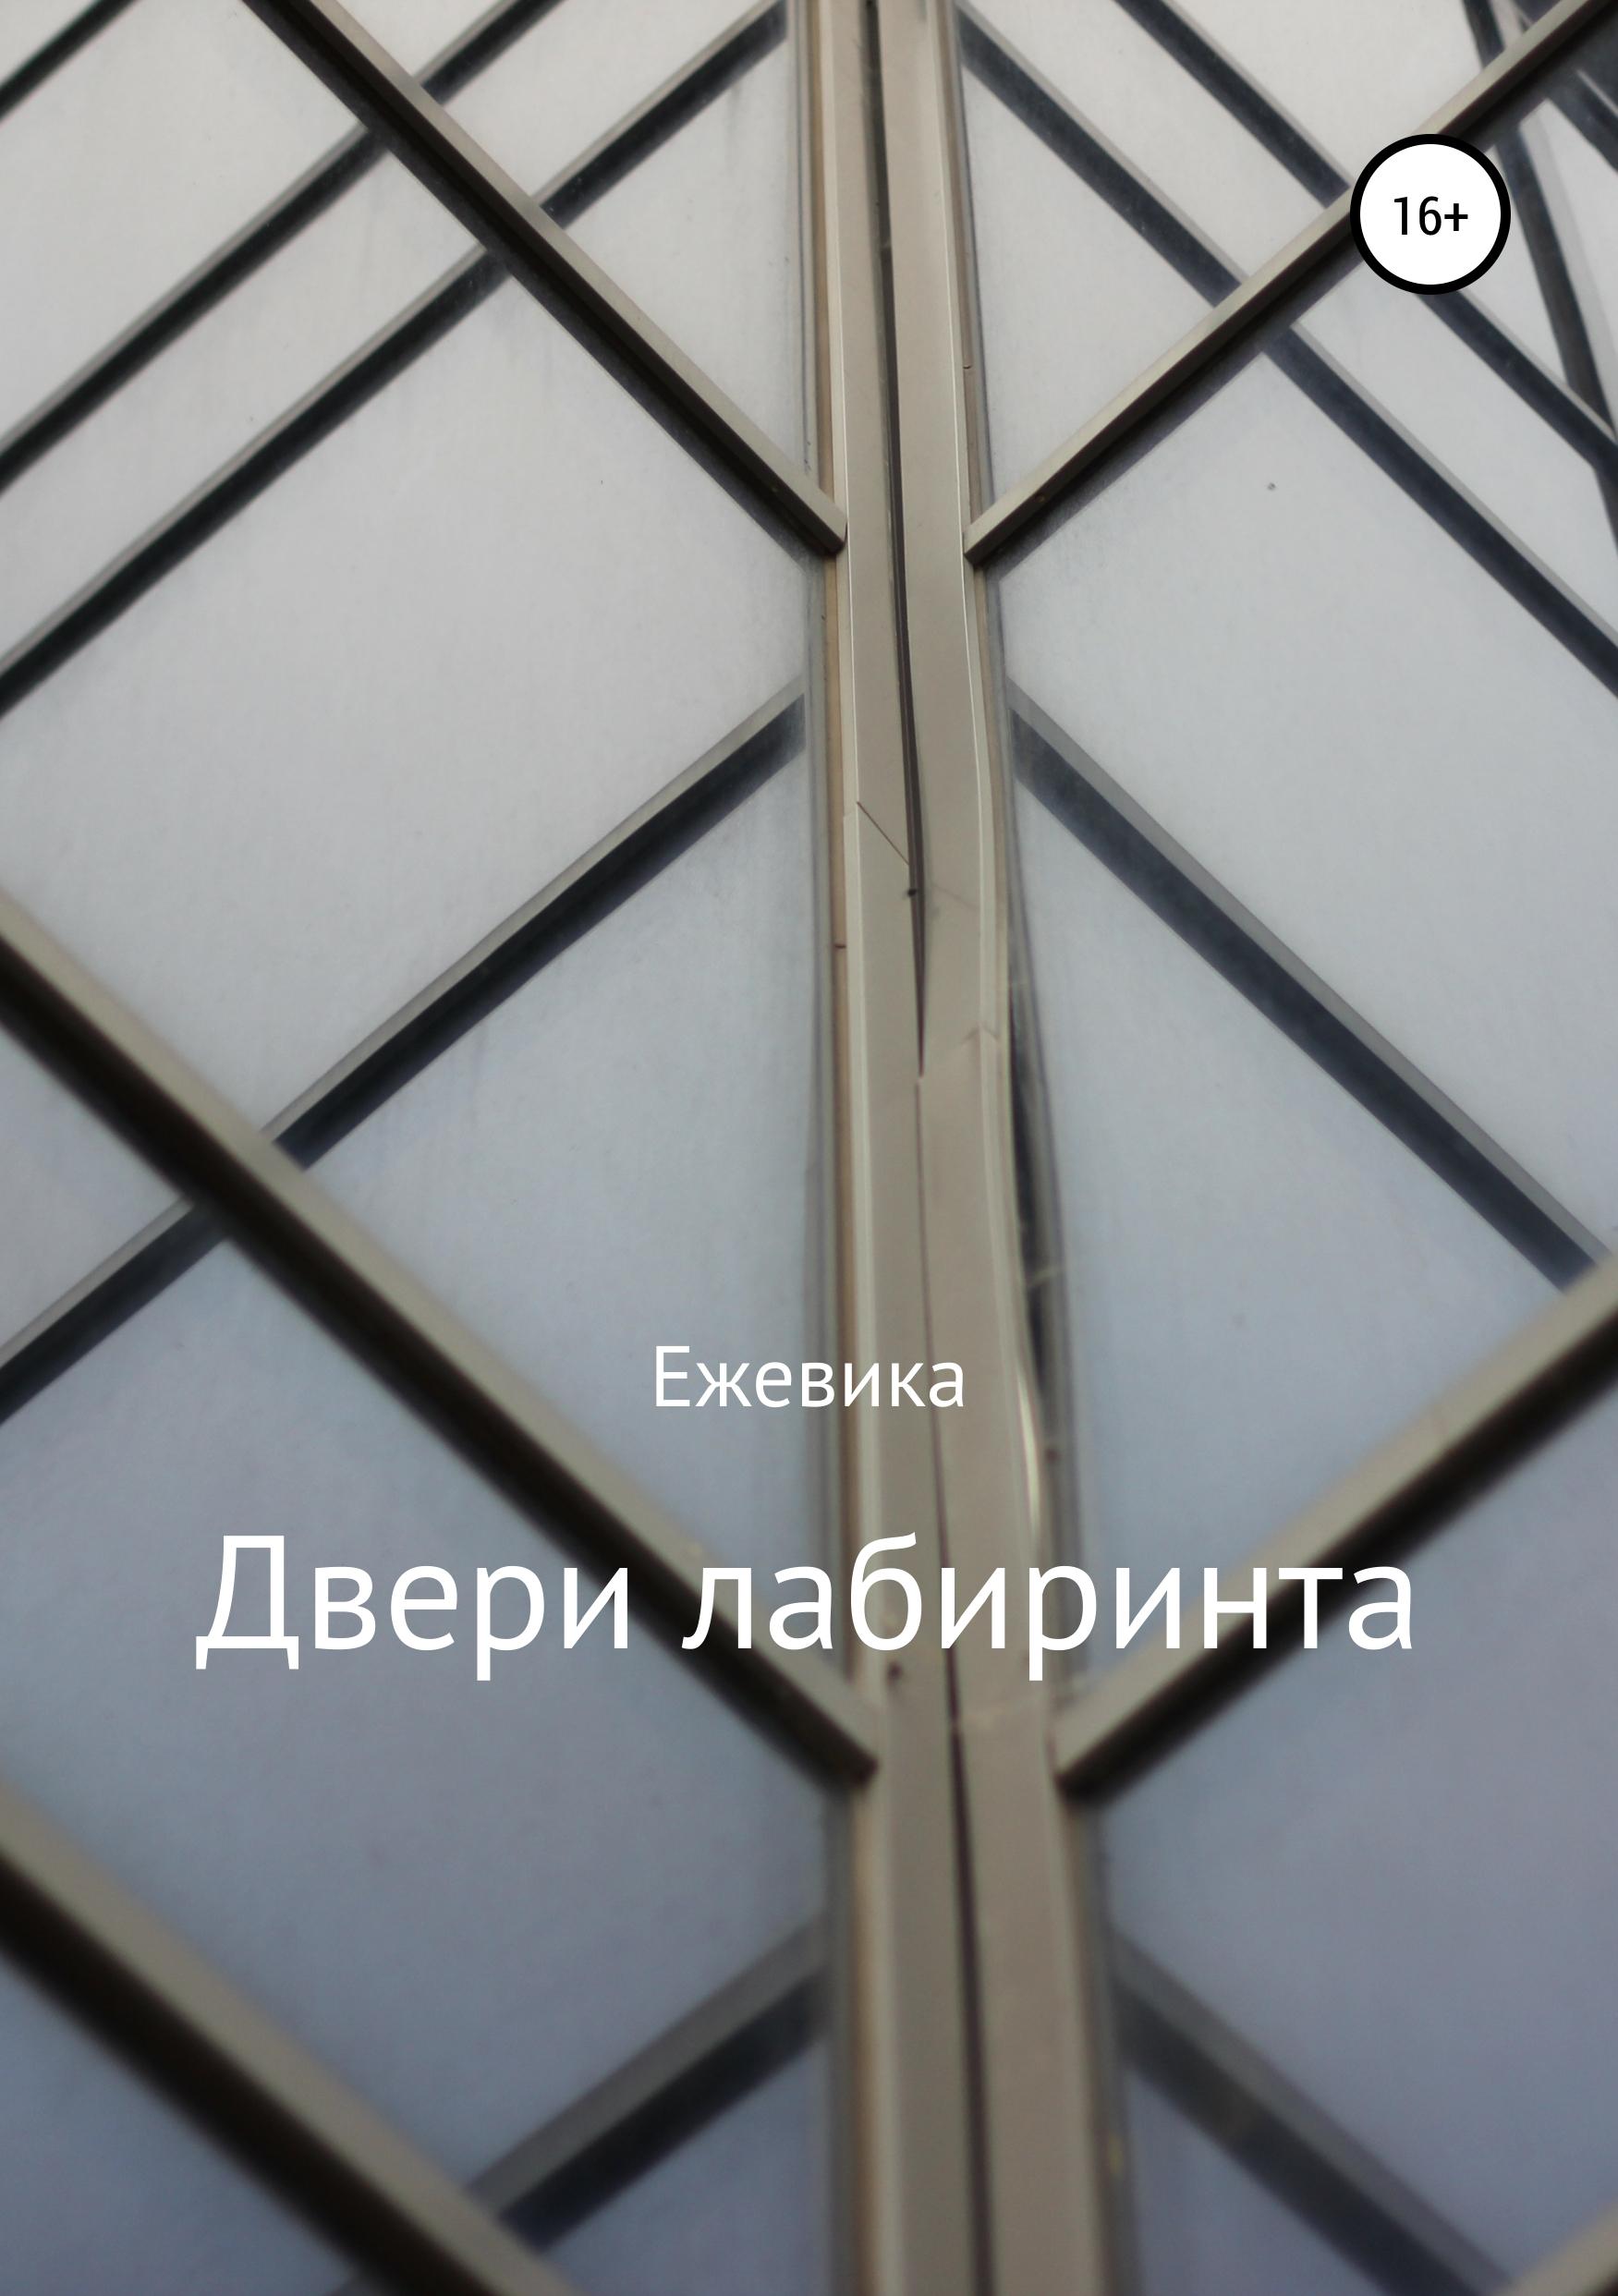 Имя Ежевика Двери лабиринта клещевич о в алхимия выход из спагирического лабиринта